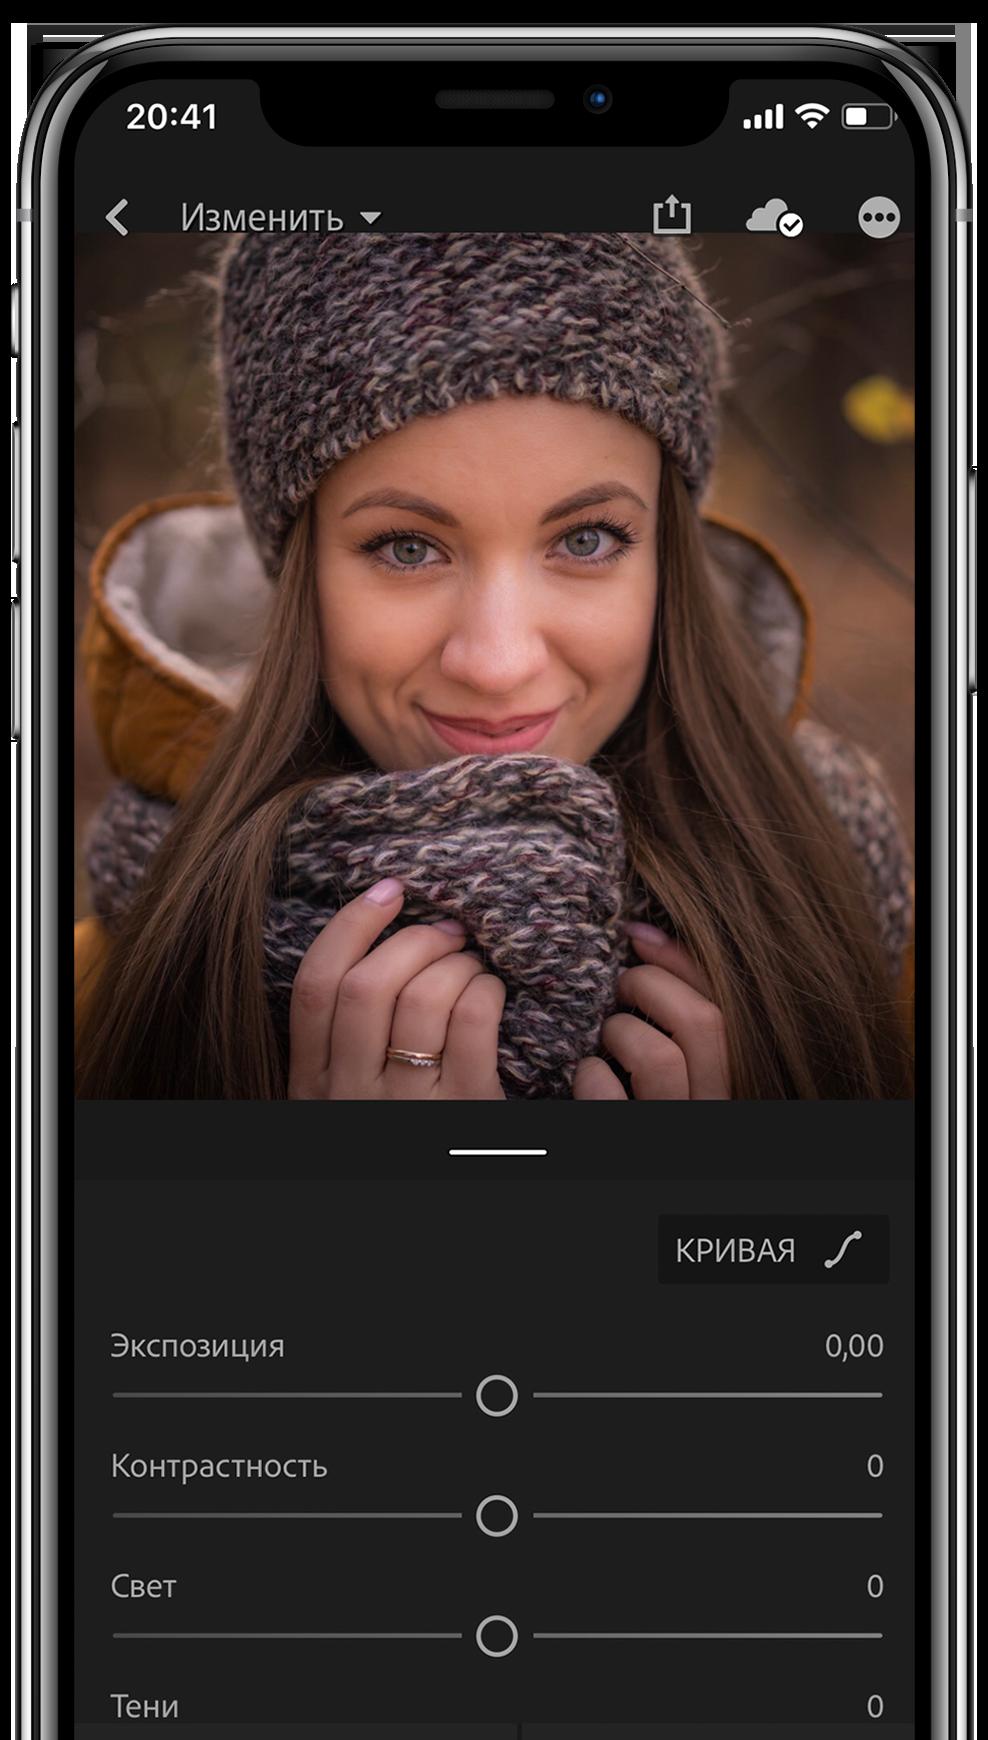 английского носителями приложения на телефон для обработки фото случаи